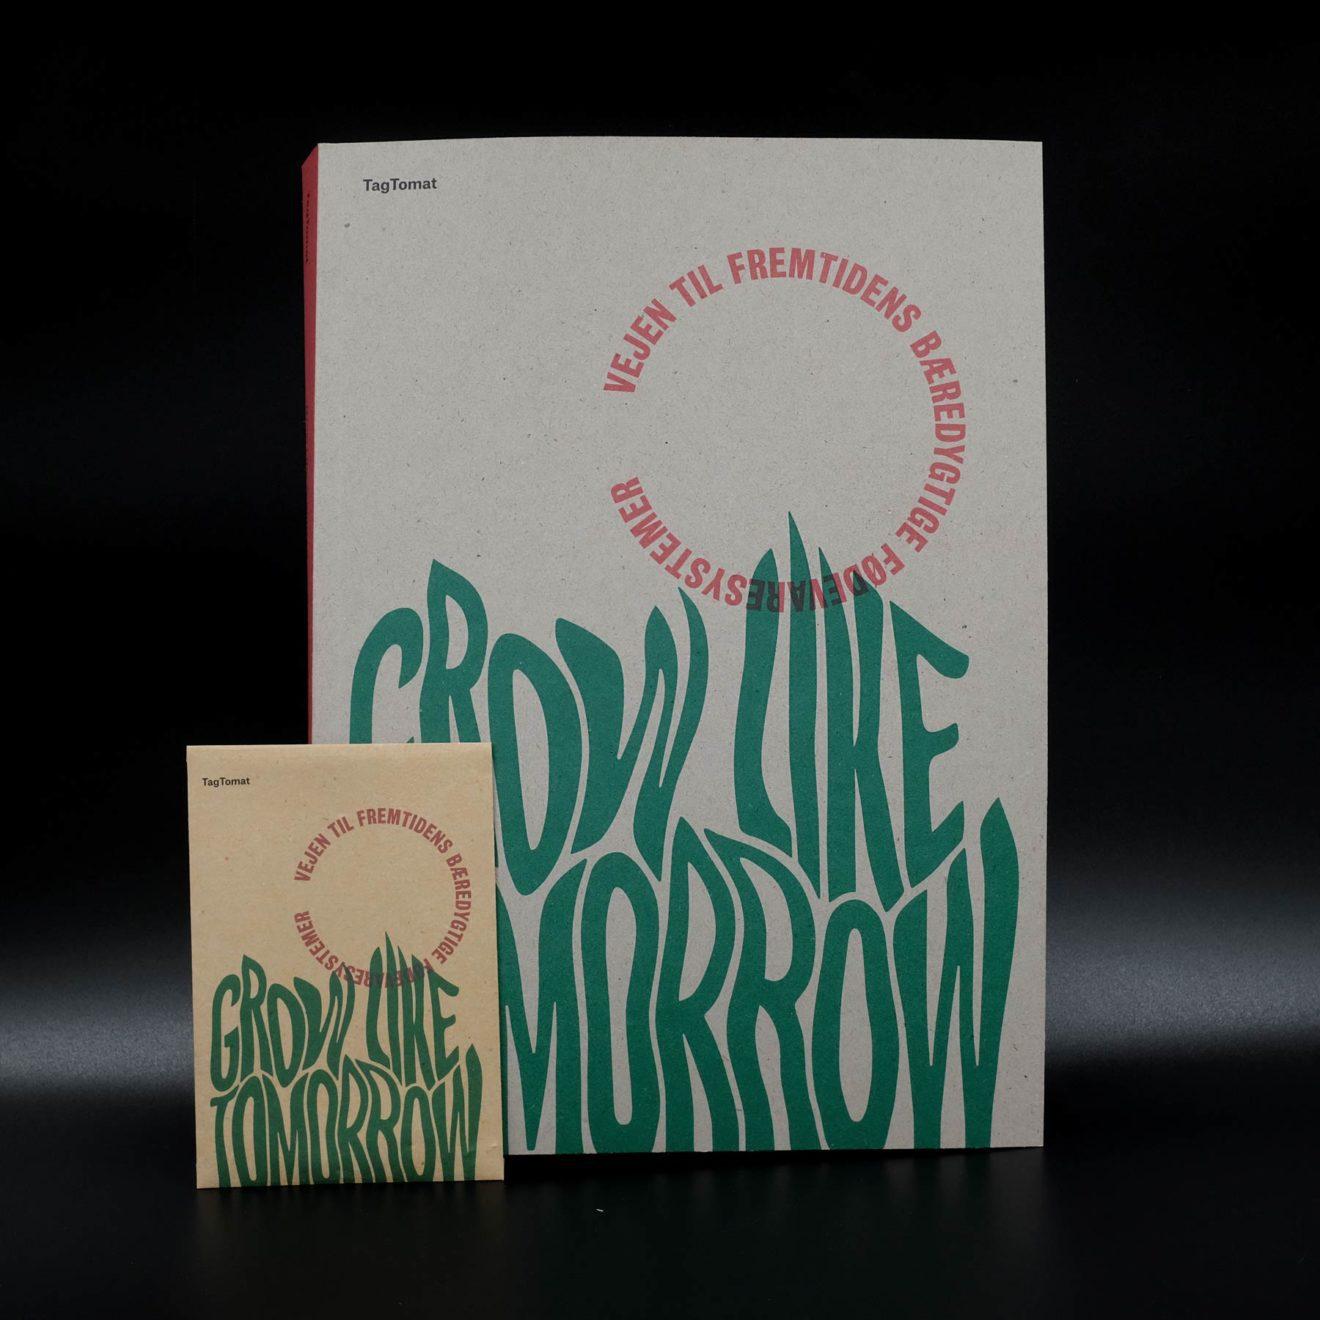 TagTomat - Grow Like Tomorrow